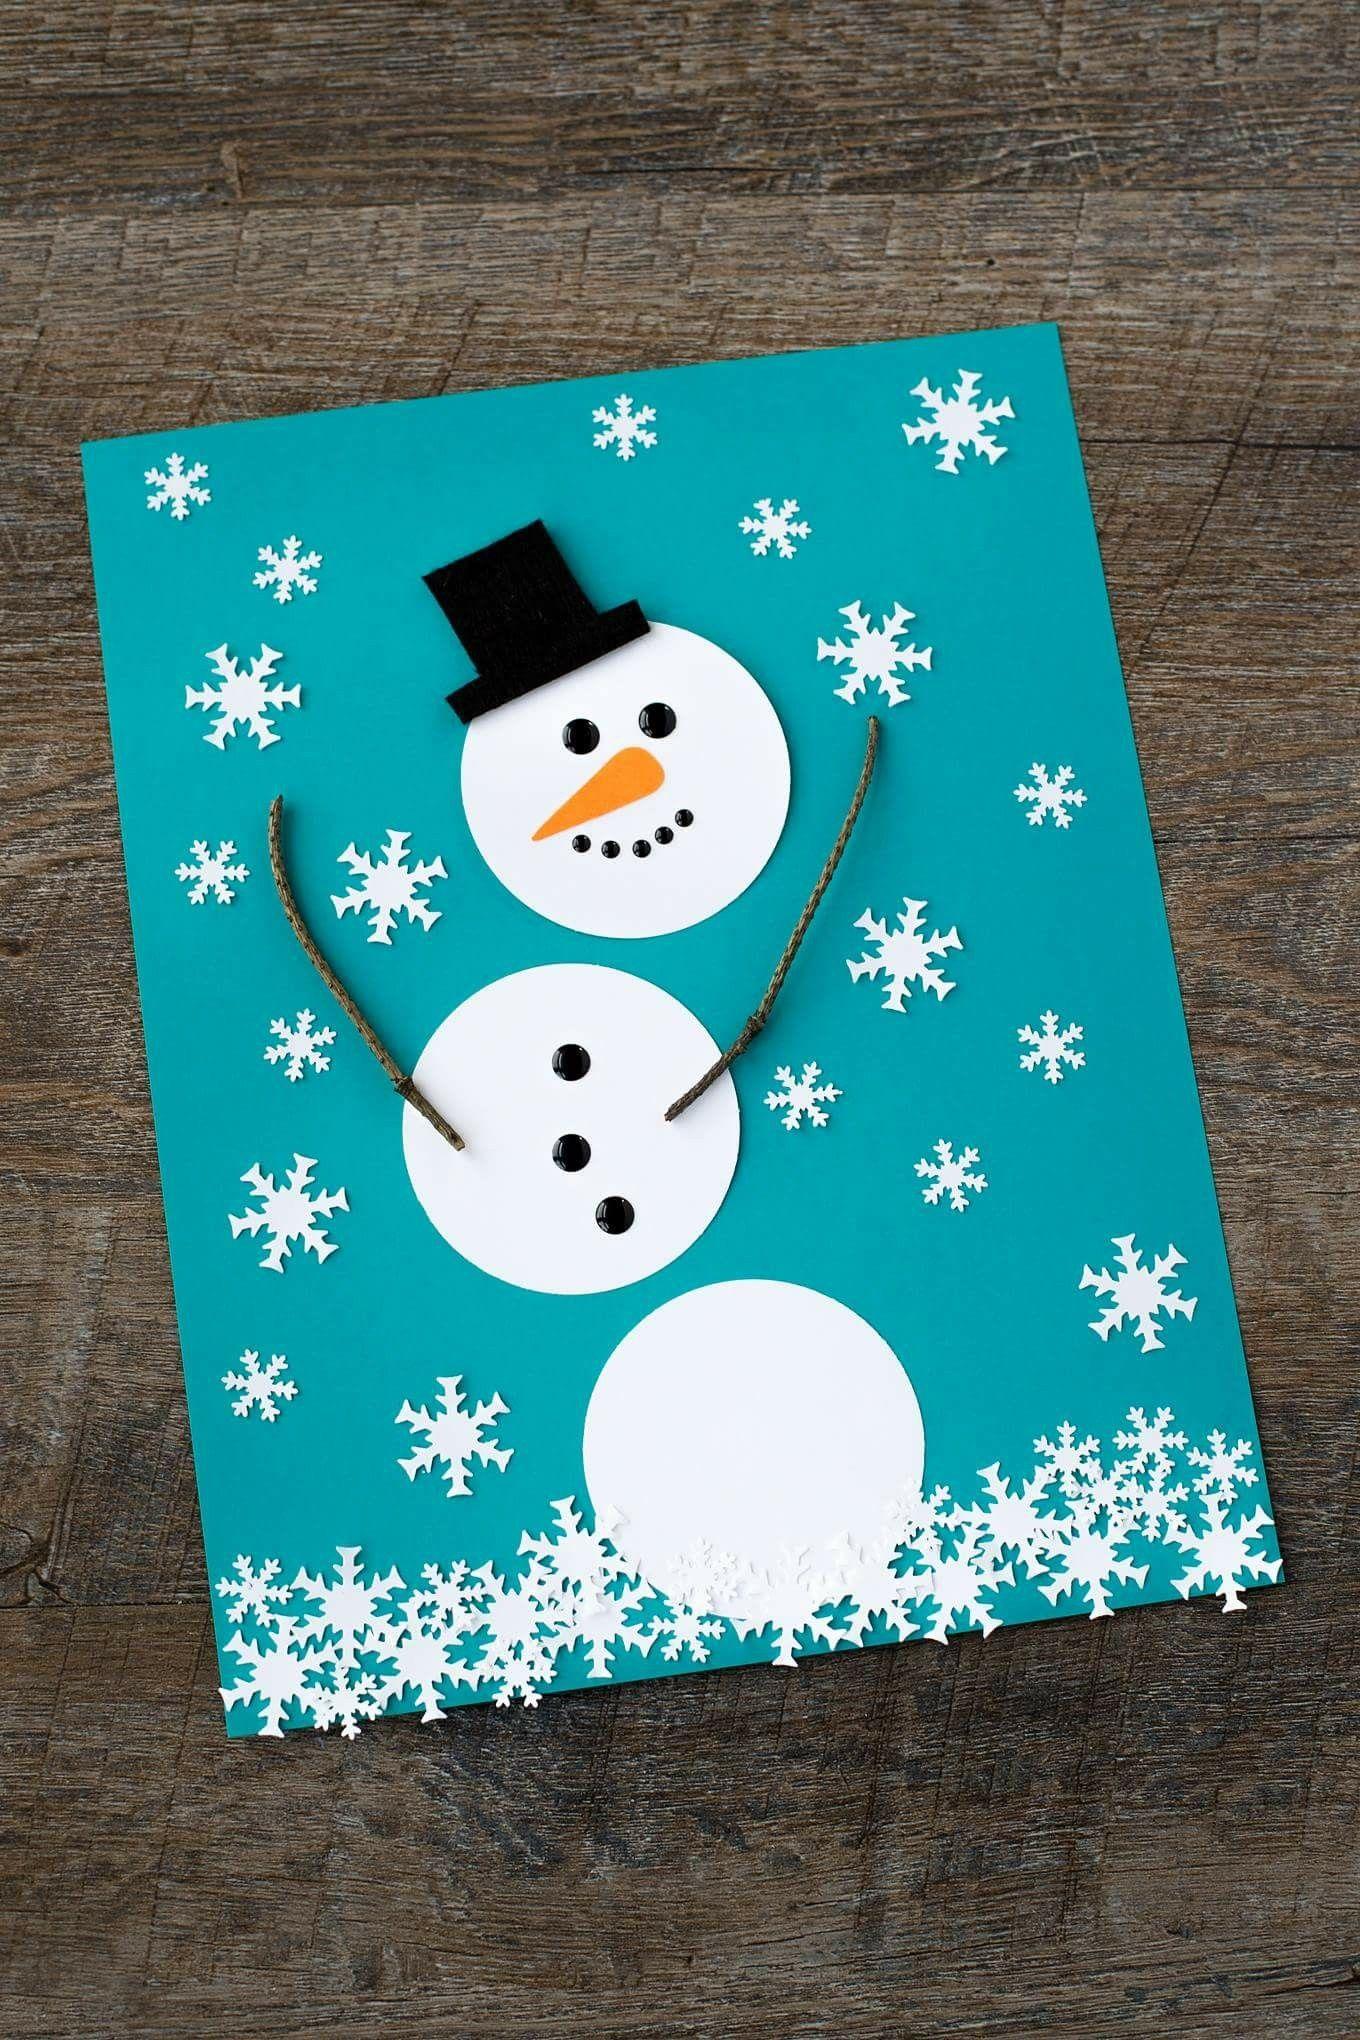 Paper Snowman Art Easy Craft For Kids